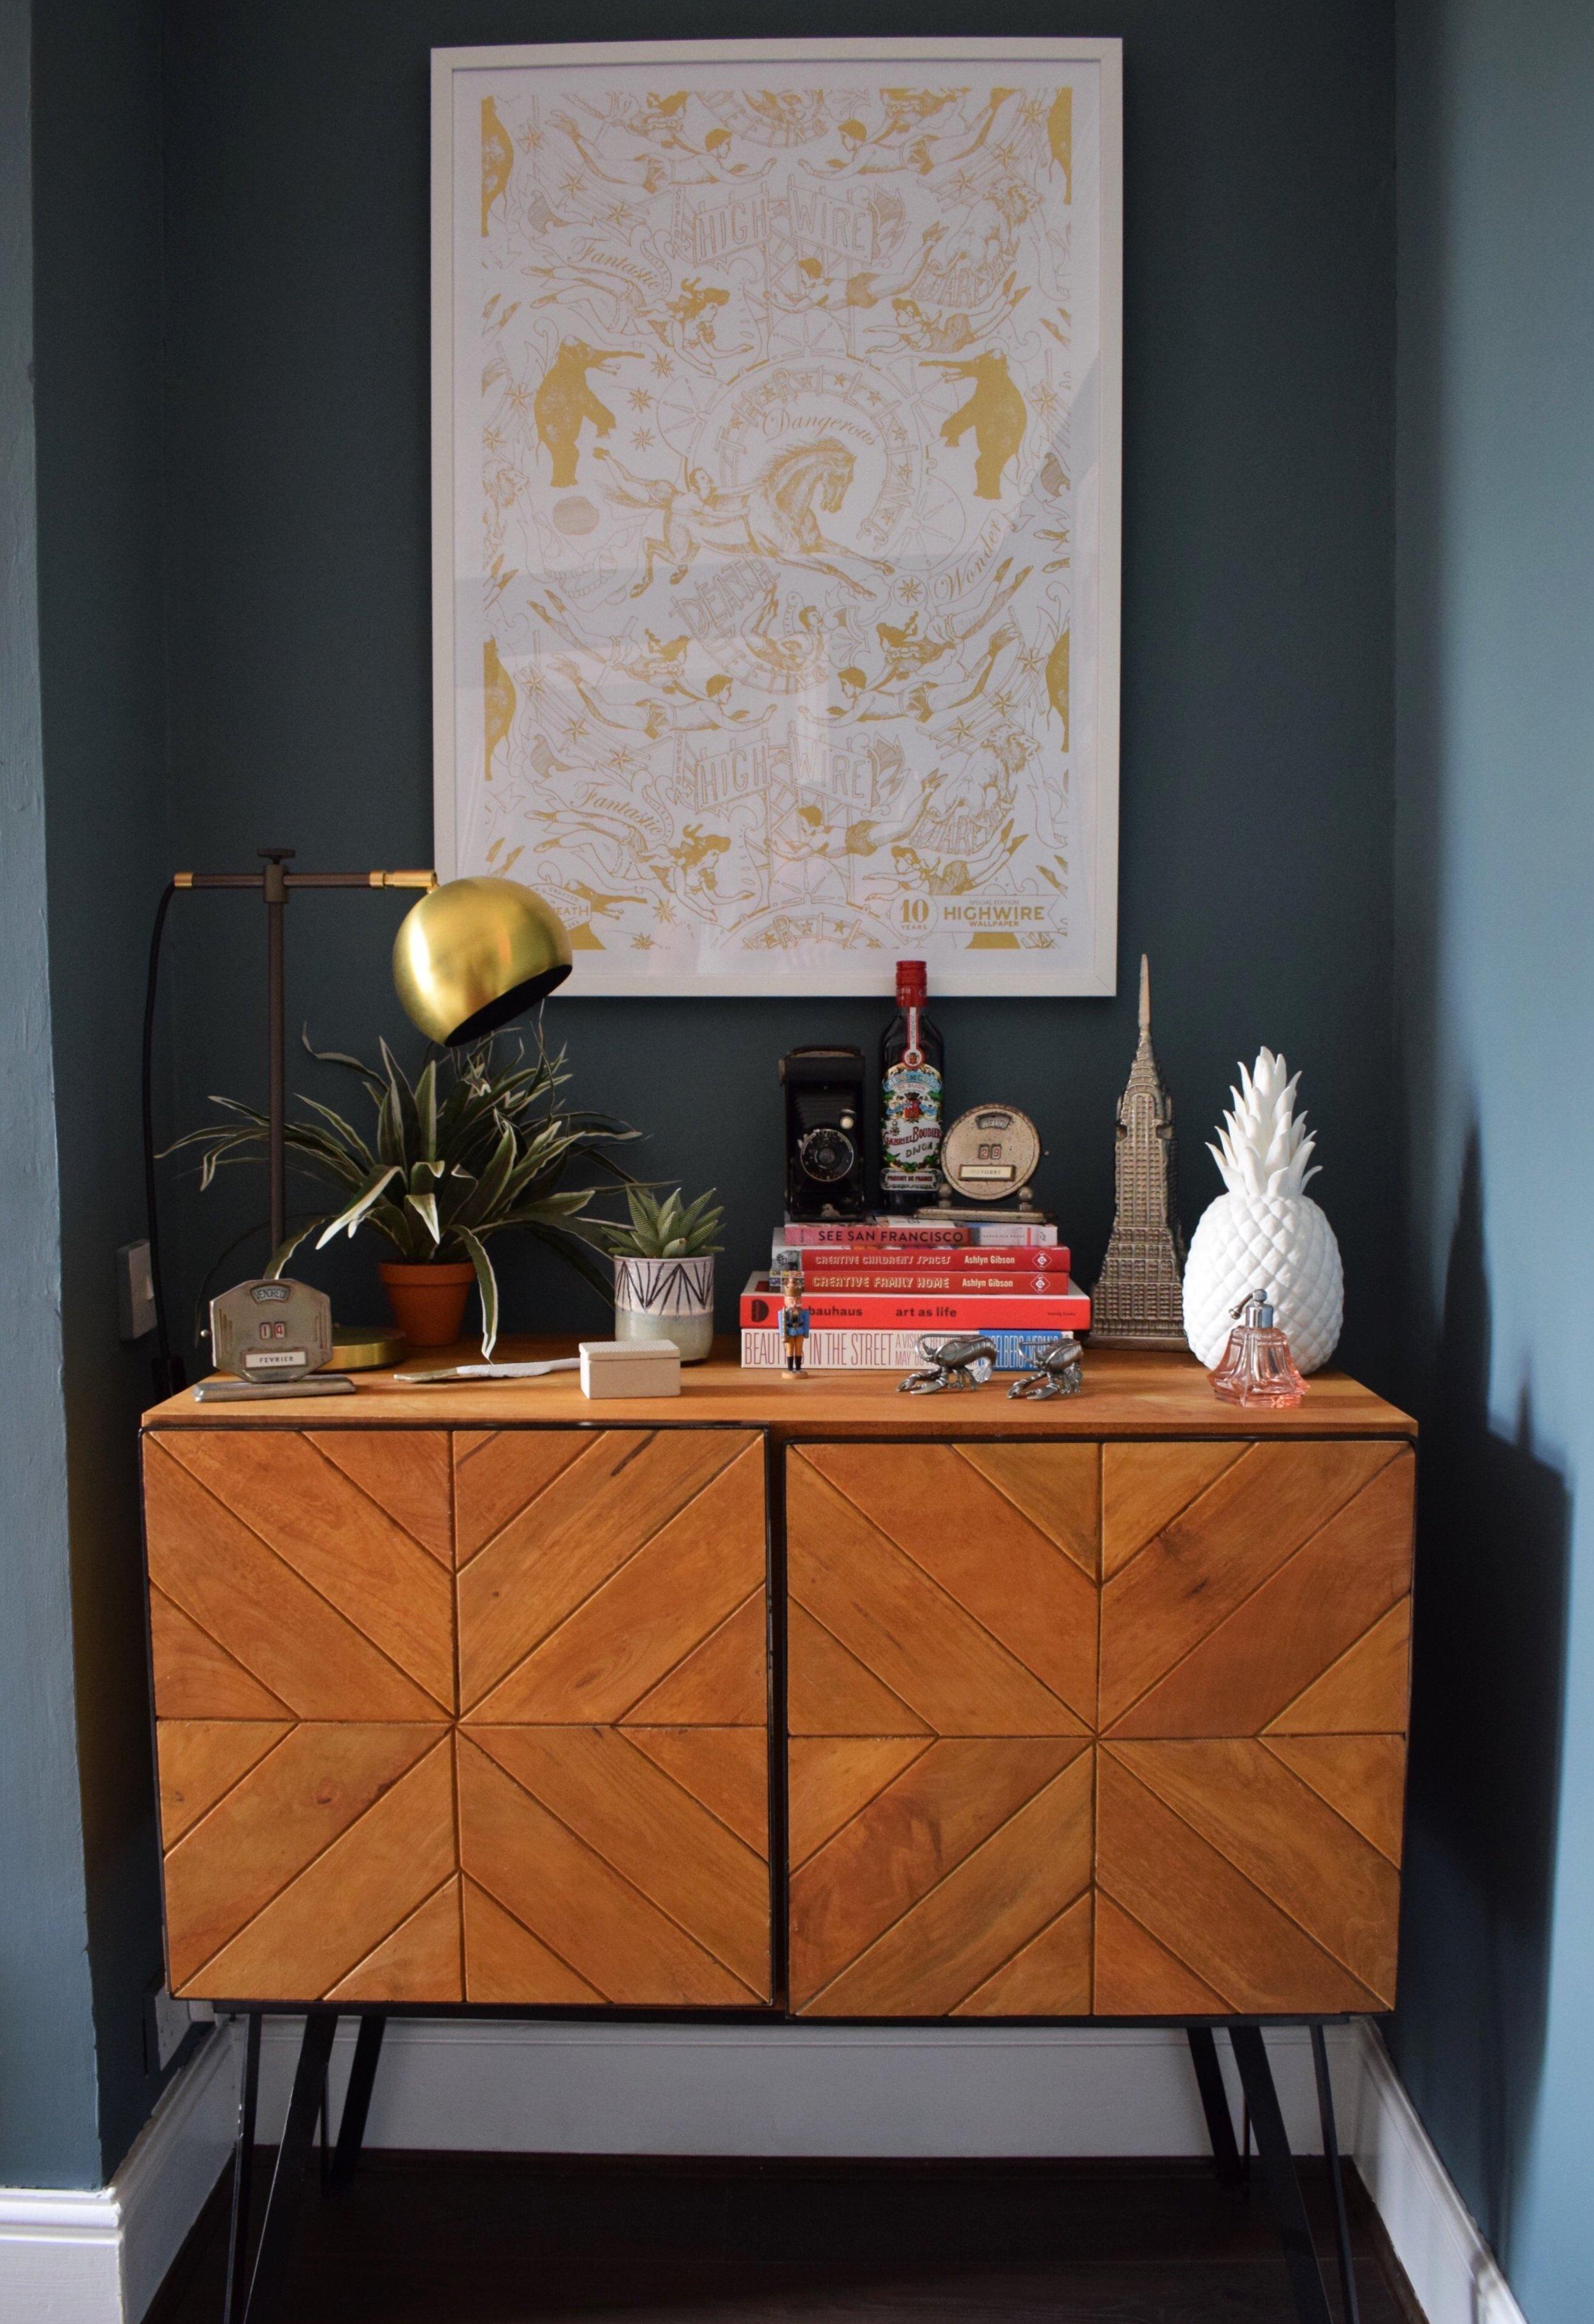 Eclectic Modern Bohemian interior decor chevron sideboard styling.JPG